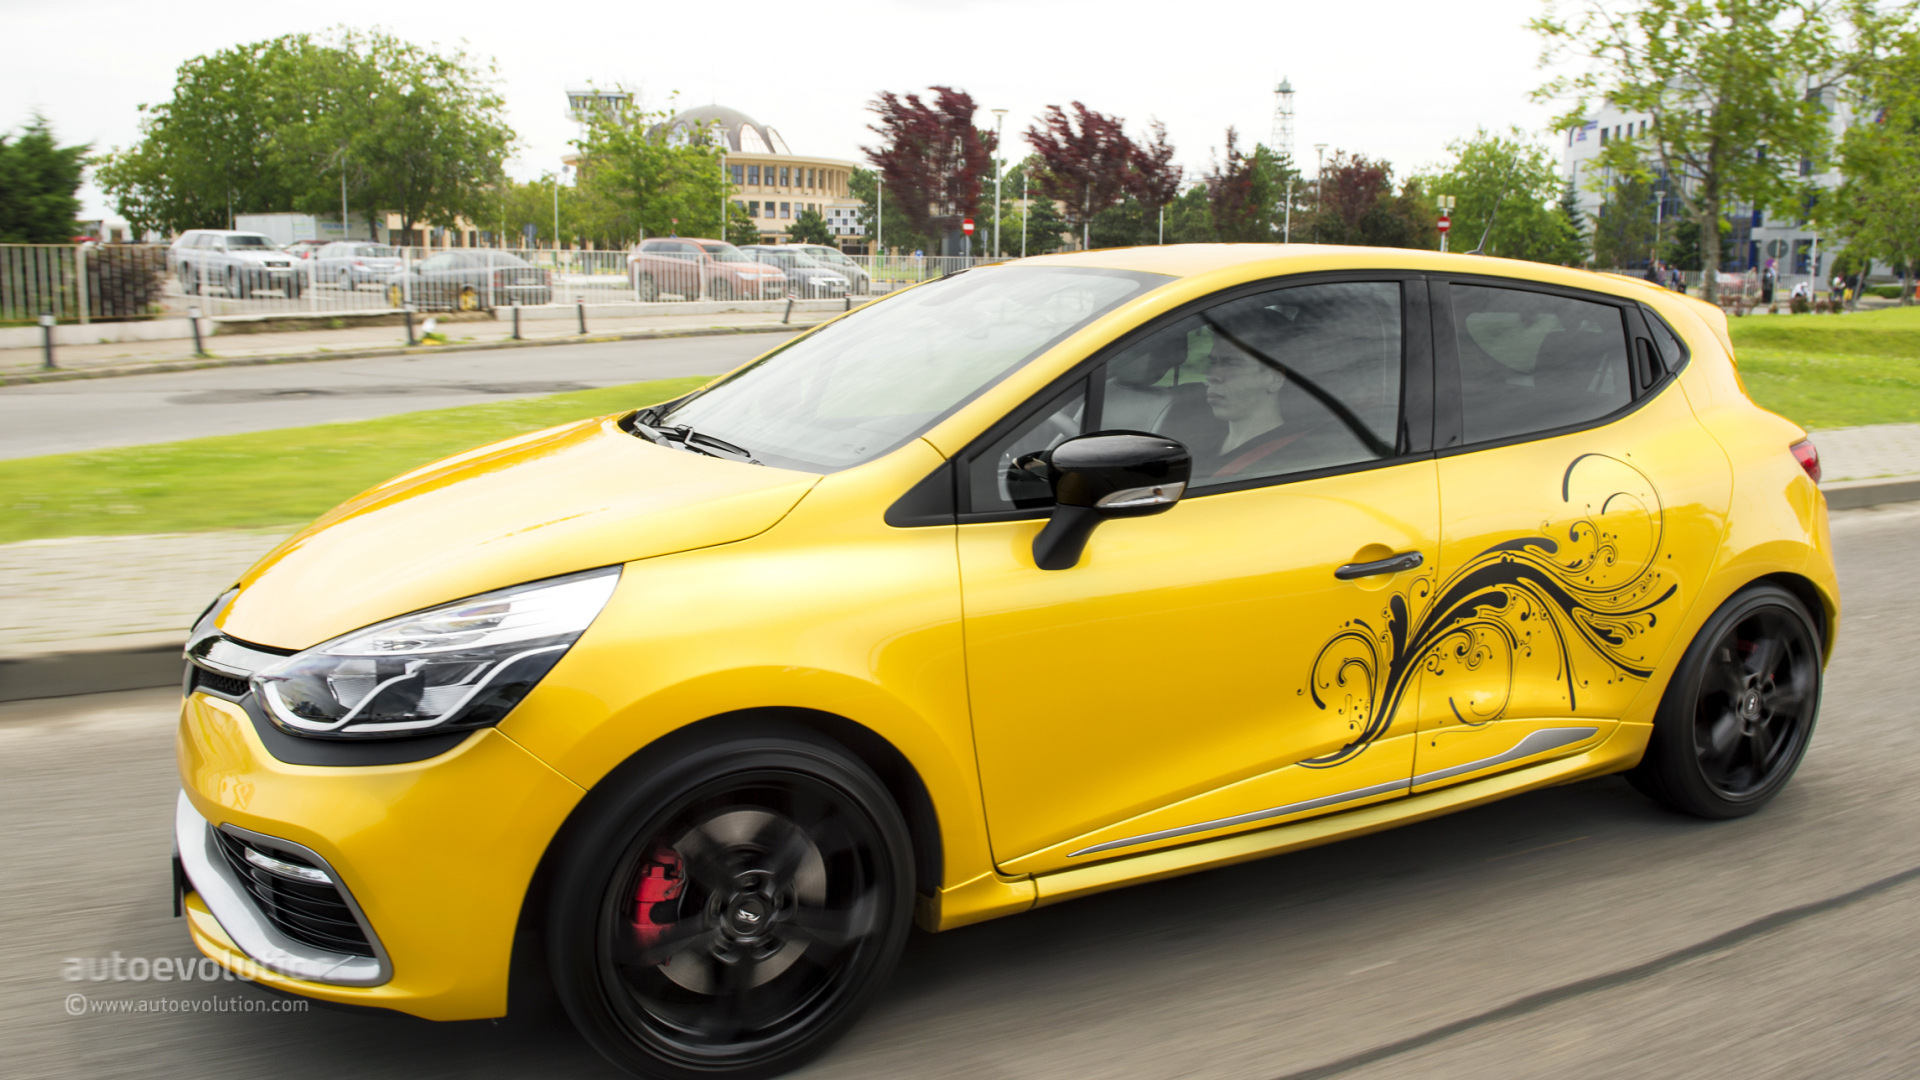 RENAULT Clio RS 200 Review - autoevolution